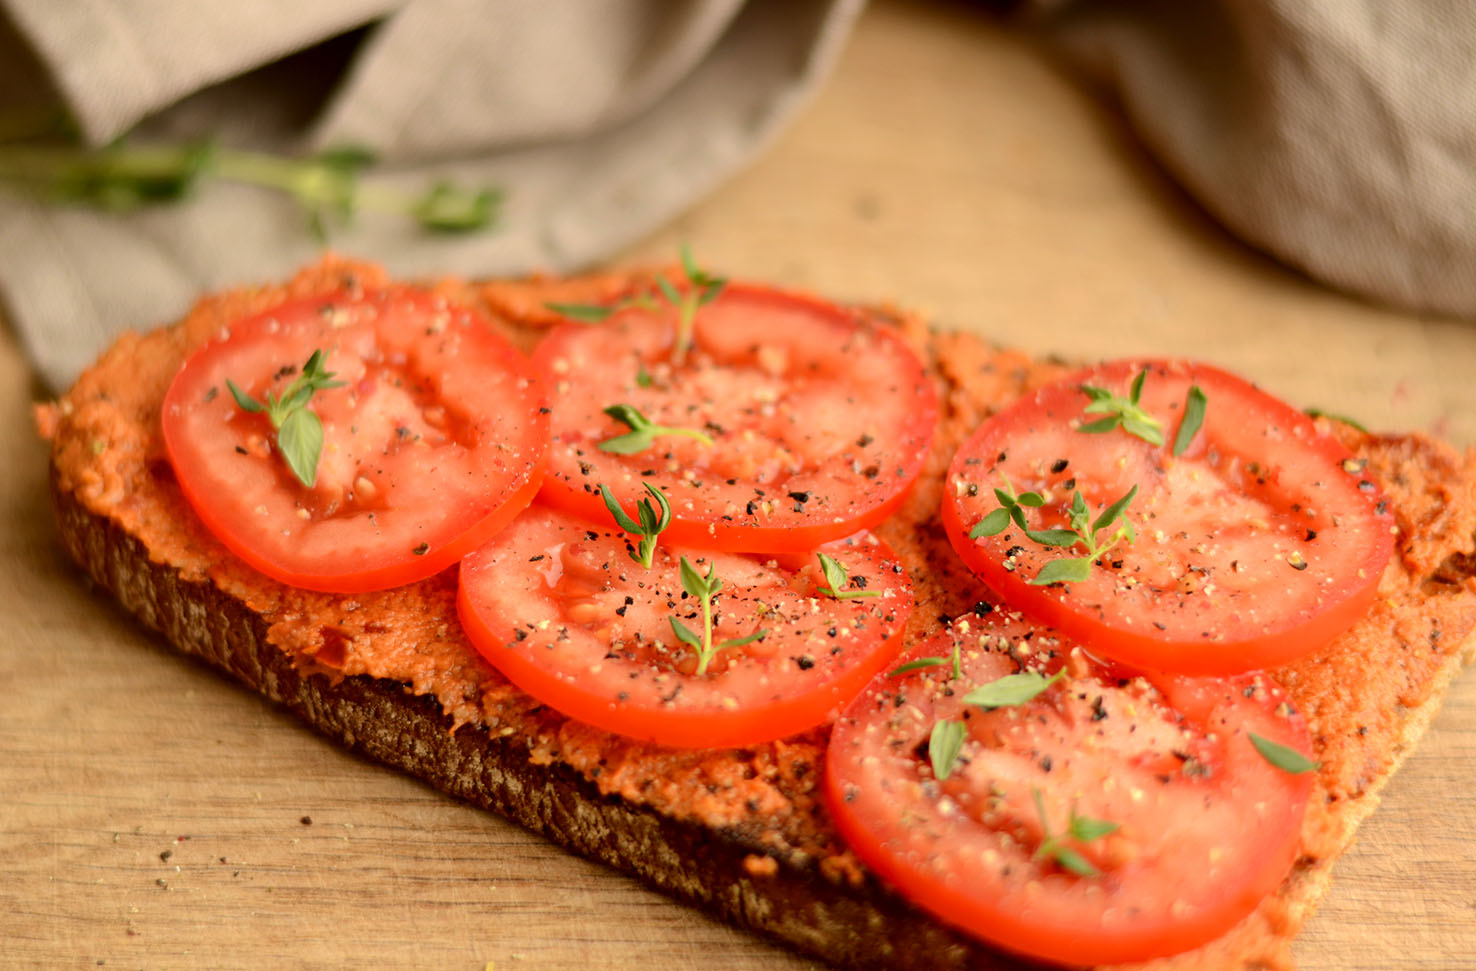 Pesto Rosso auf geröstetem Brot mit Tomaten